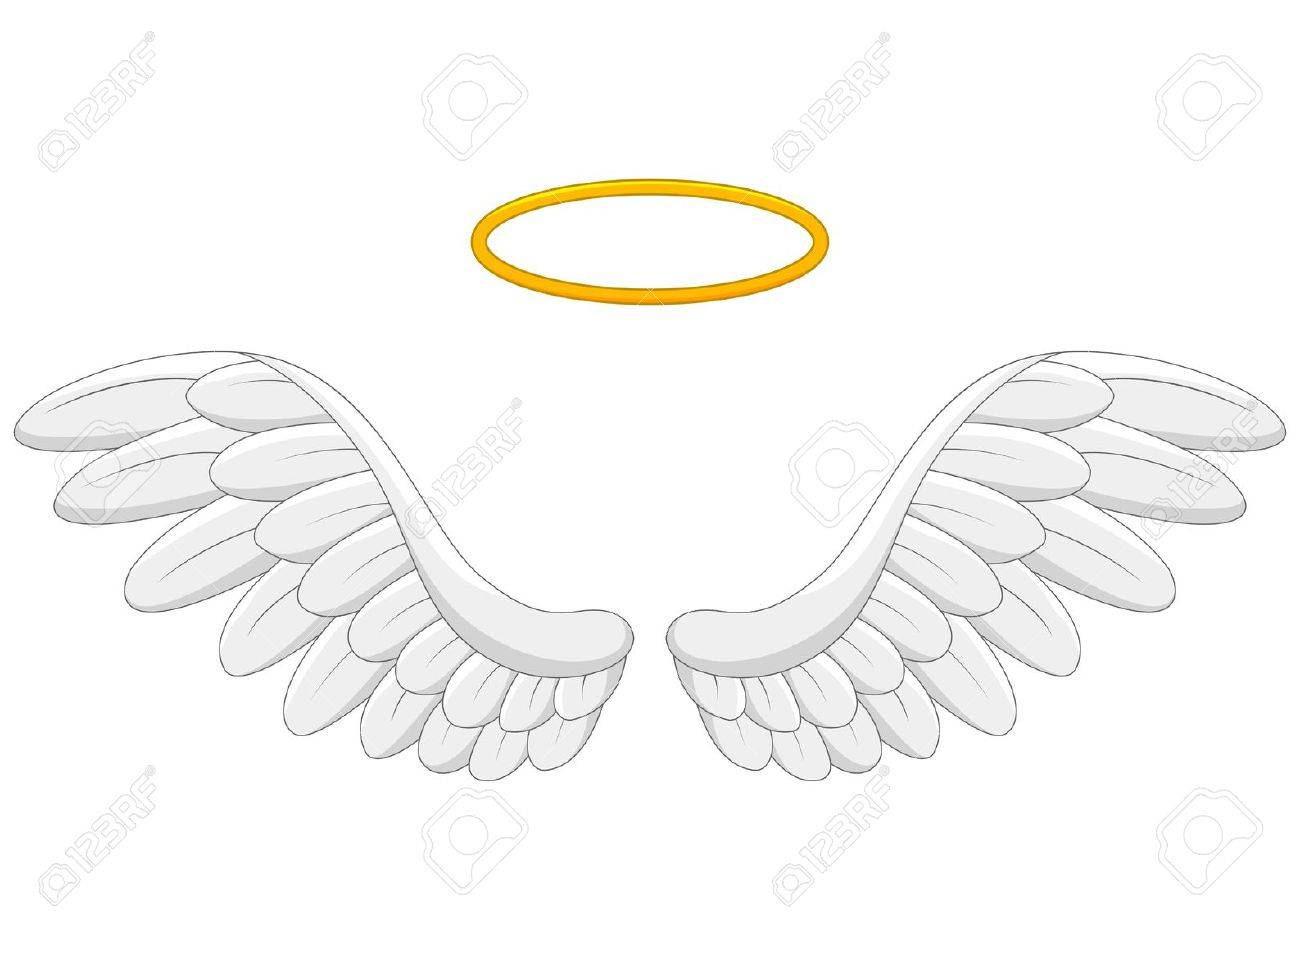 angel wings cartoon royalty free cliparts vectors and stock rh 123rf com cartoon angel wings drawing cartoon angel wings png